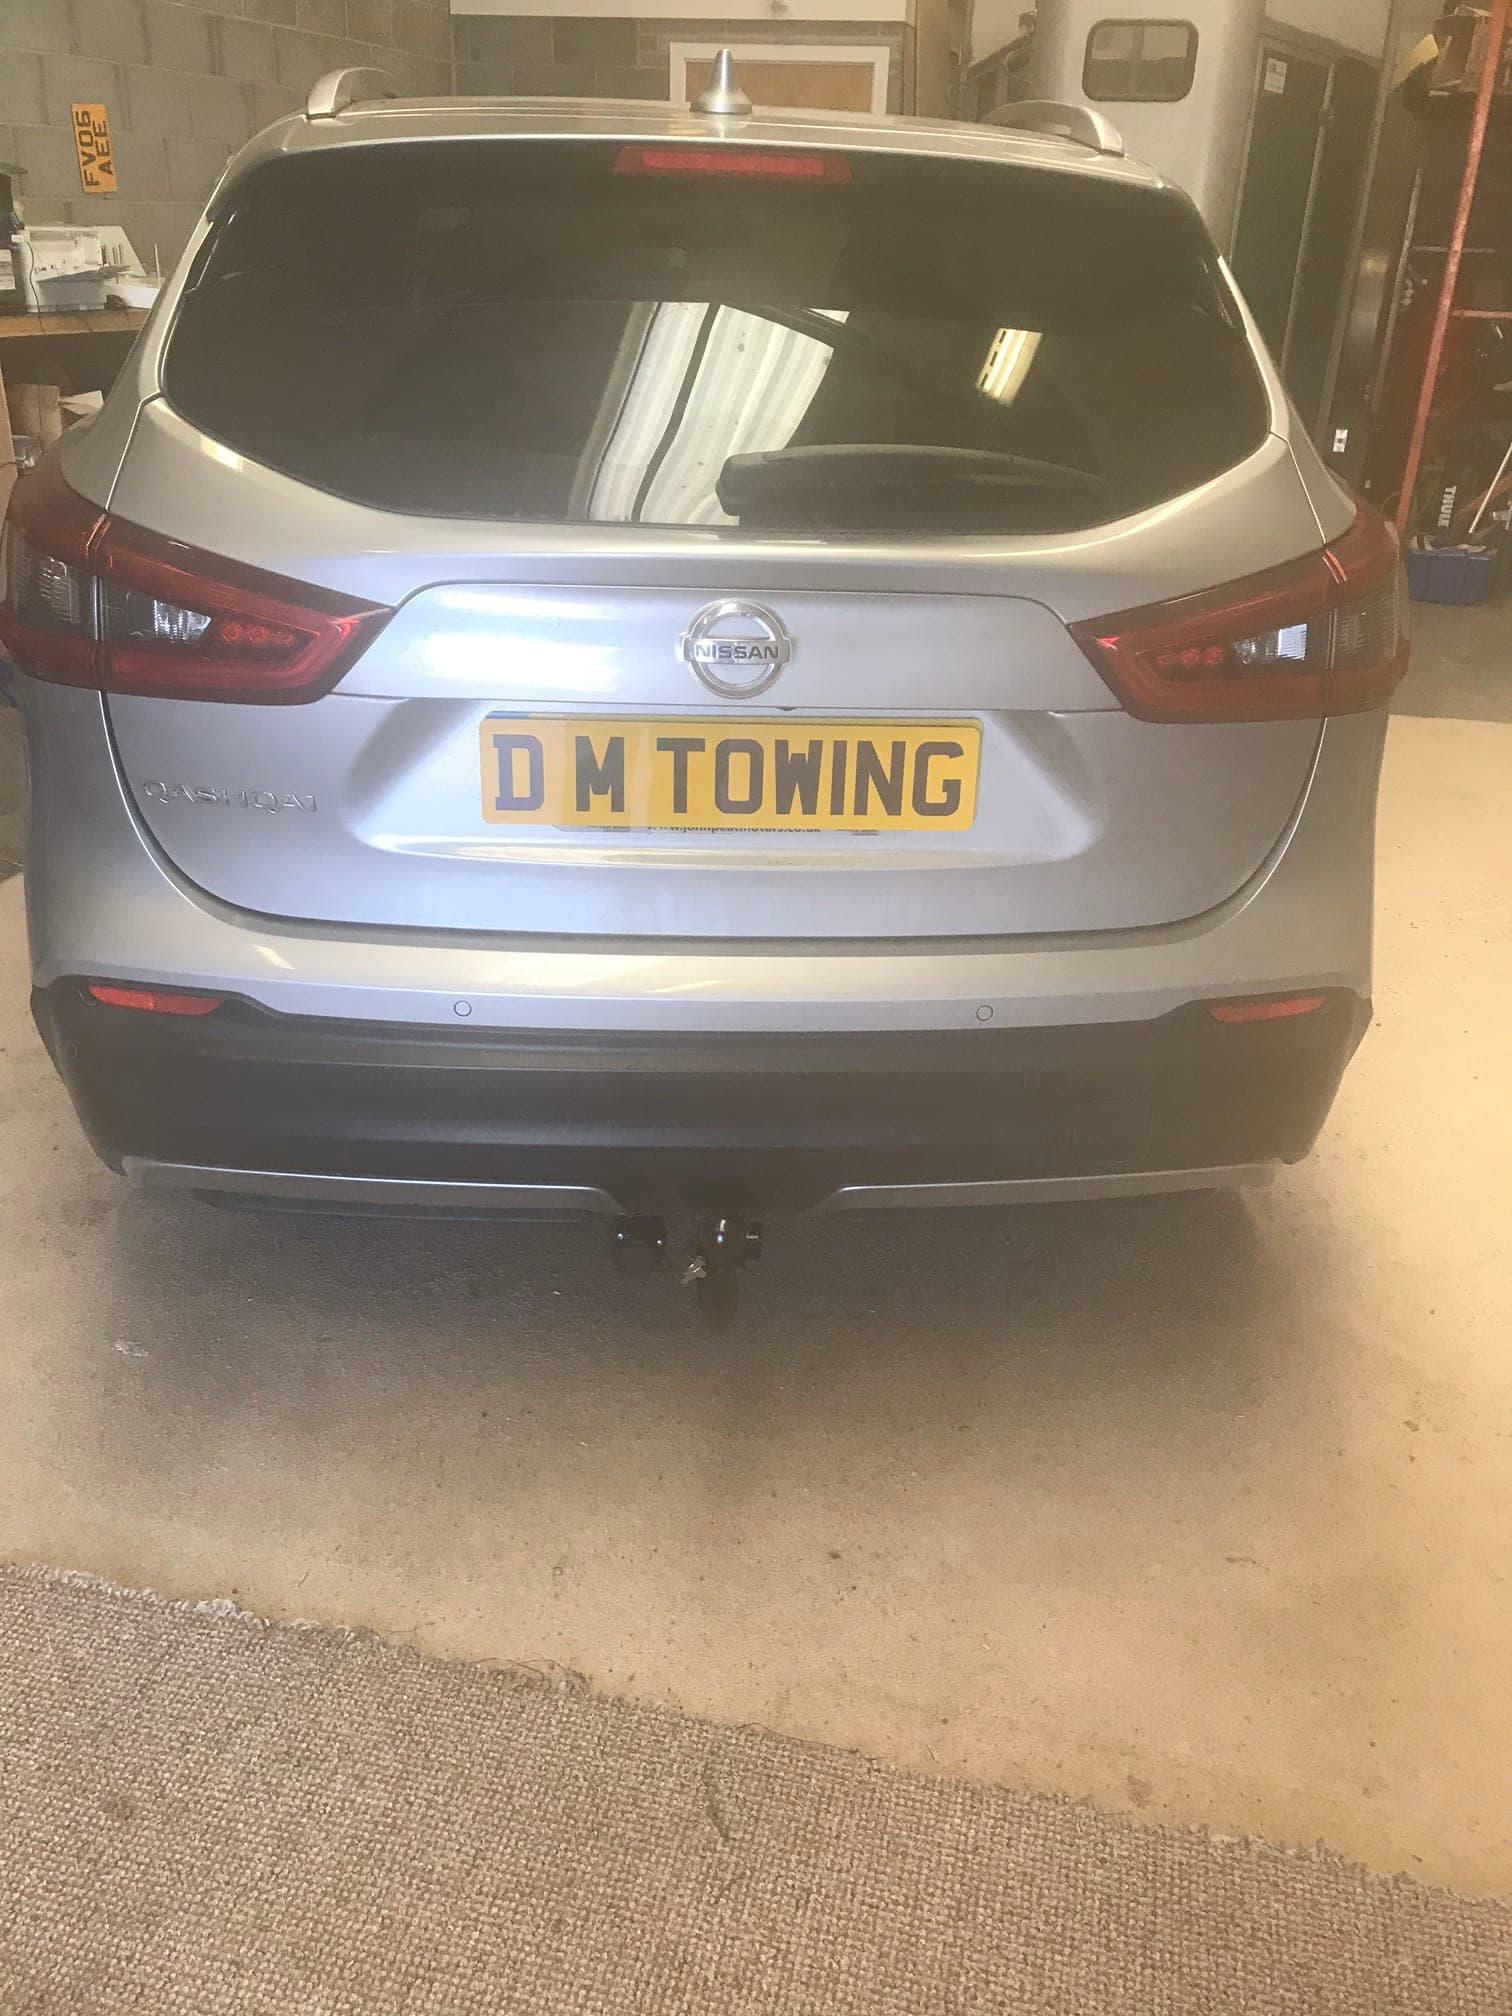 D & M Towing Ltd Sleaford 01529 306670